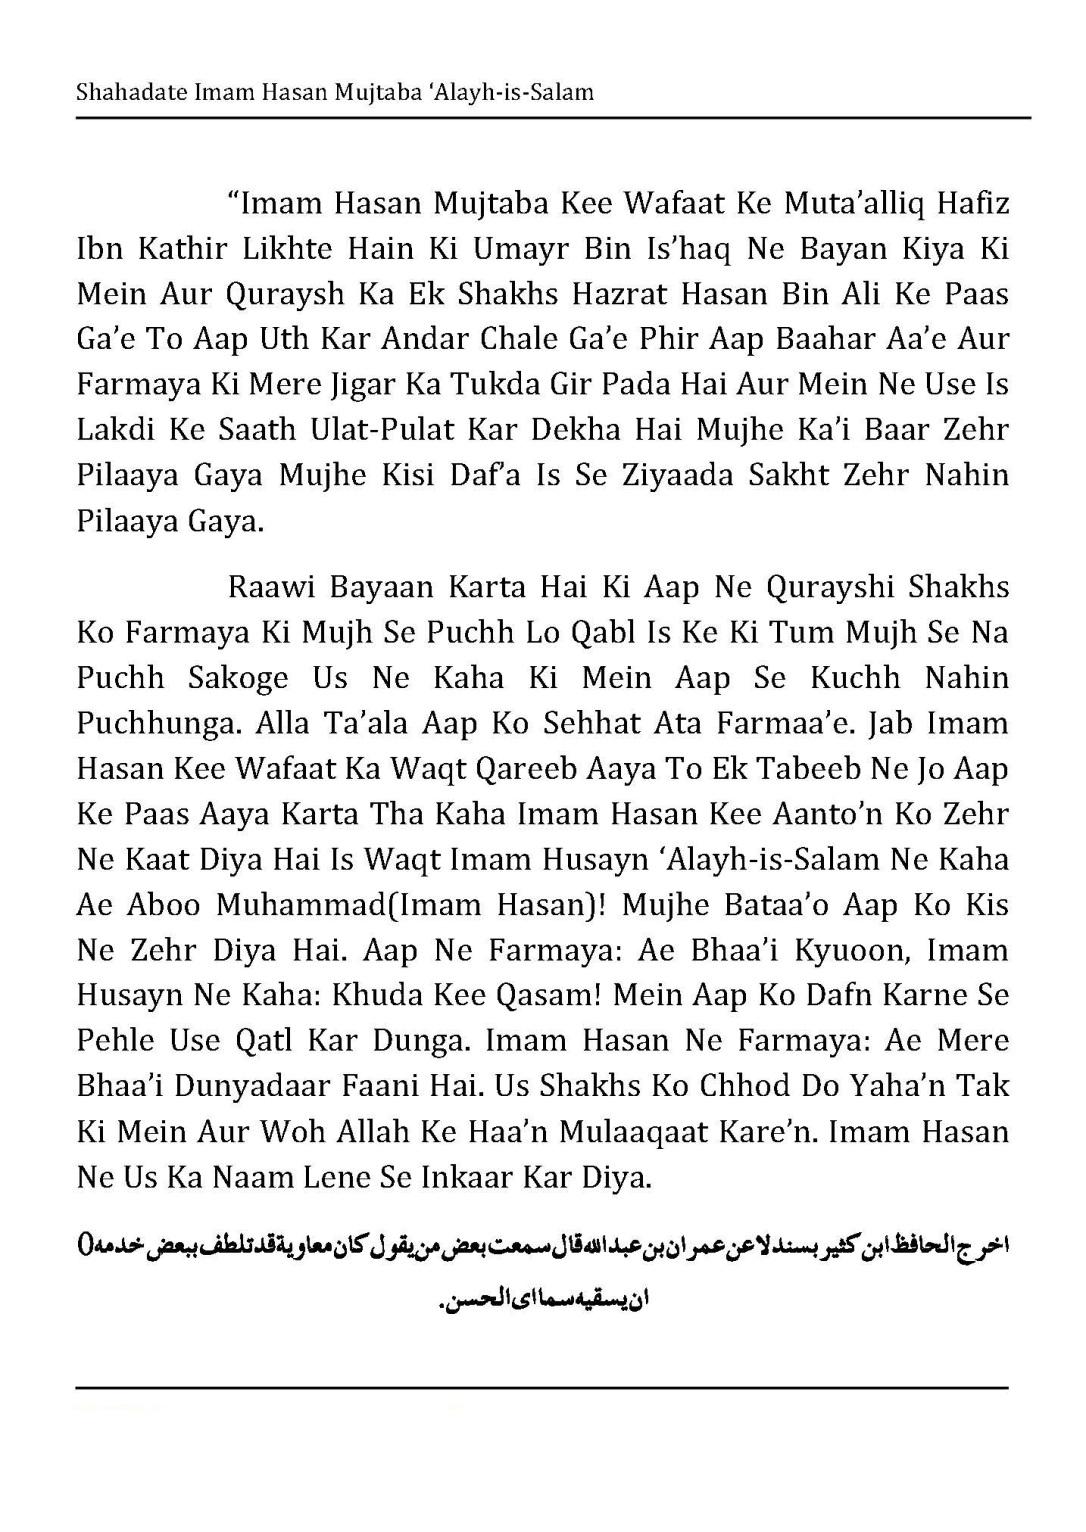 shahadate-imam-hasan-mujtaba-e28098alayh-is-salam-pdf_unlocked_Page_07